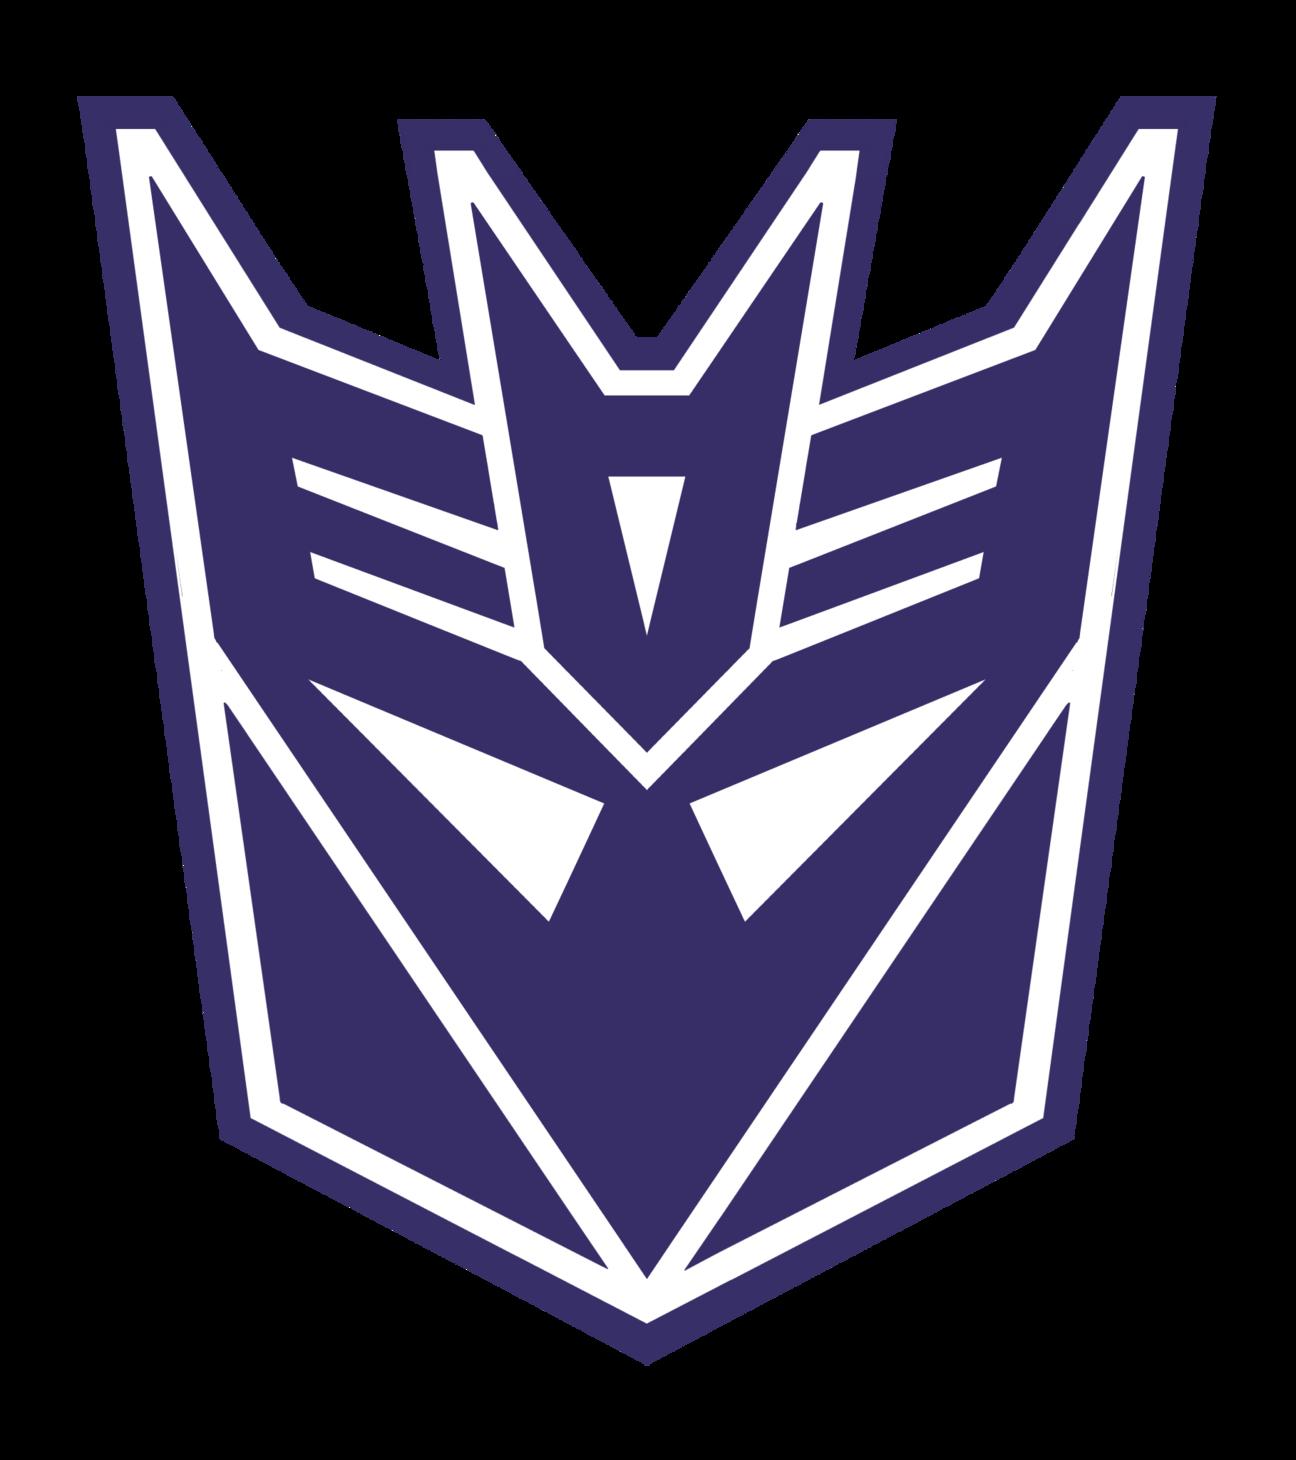 Transformers Autobot Logo Vector Download Transformer Birthday Transformers Transformers Birthday Parties